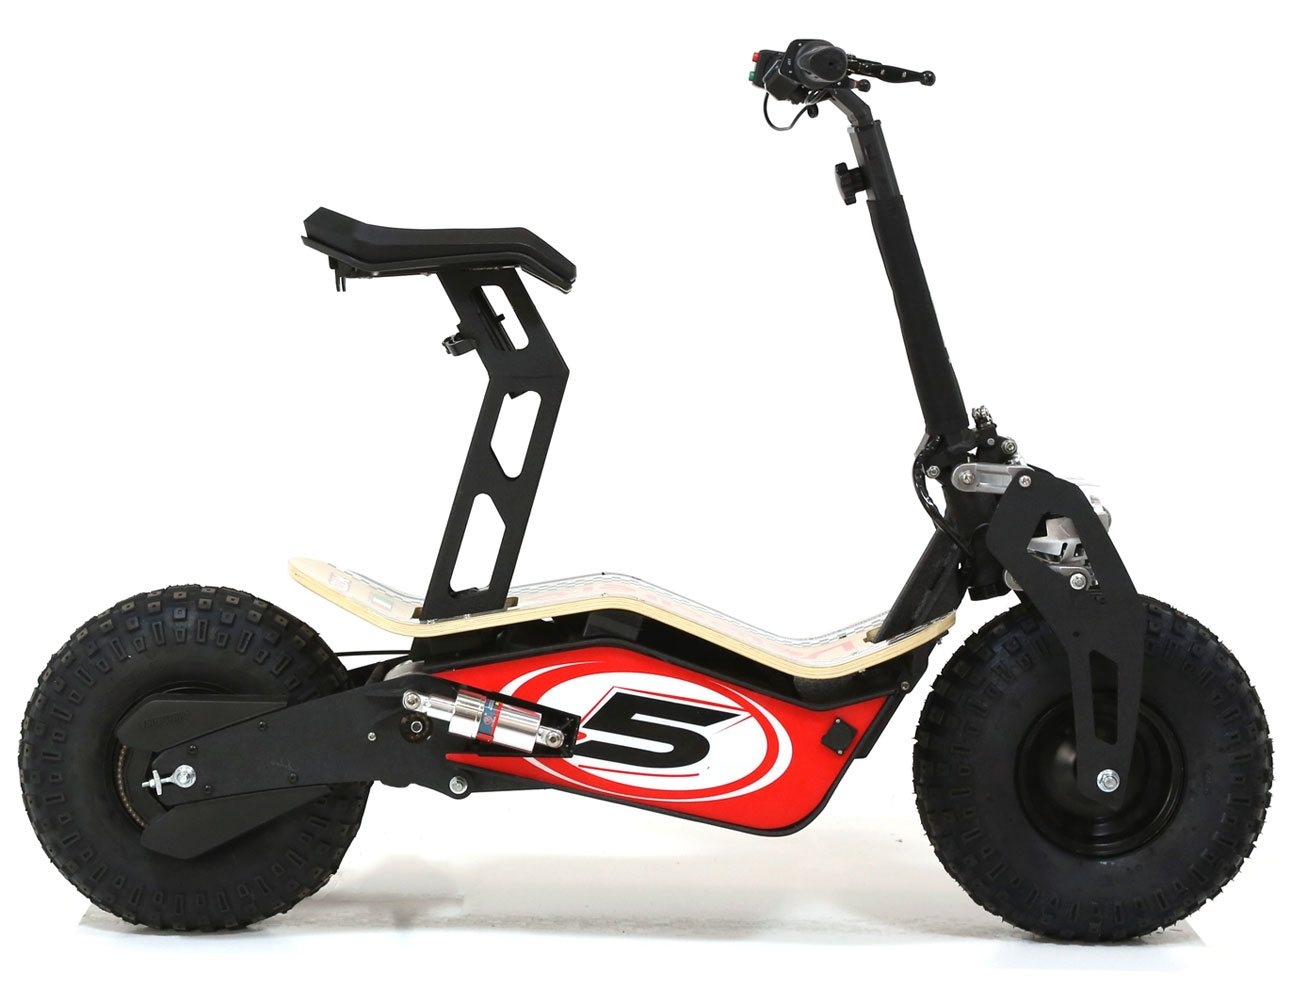 velocifero mad 48 volt 1600w red no 5 electric scooter. Black Bedroom Furniture Sets. Home Design Ideas